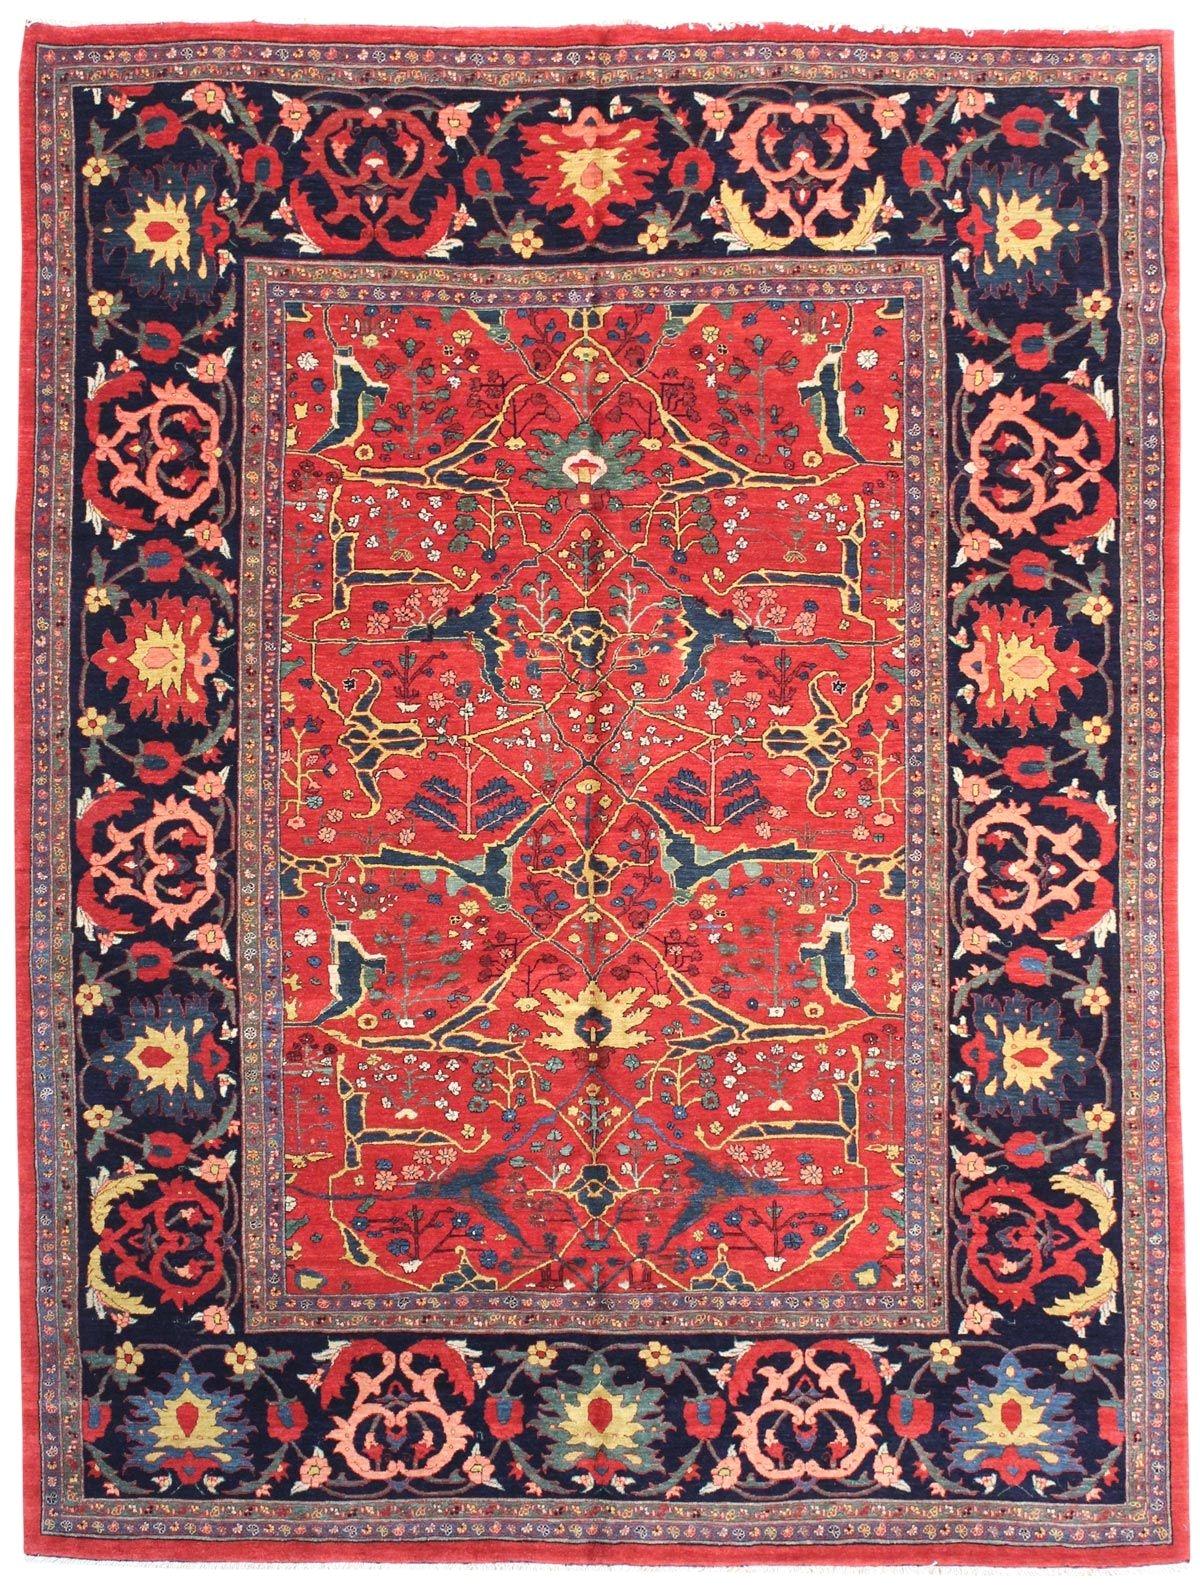 geometric oriental rugs gallery persian bijar rug hand knotted in persia size 8 feet 7 inch es x 11 feet 9 inch es